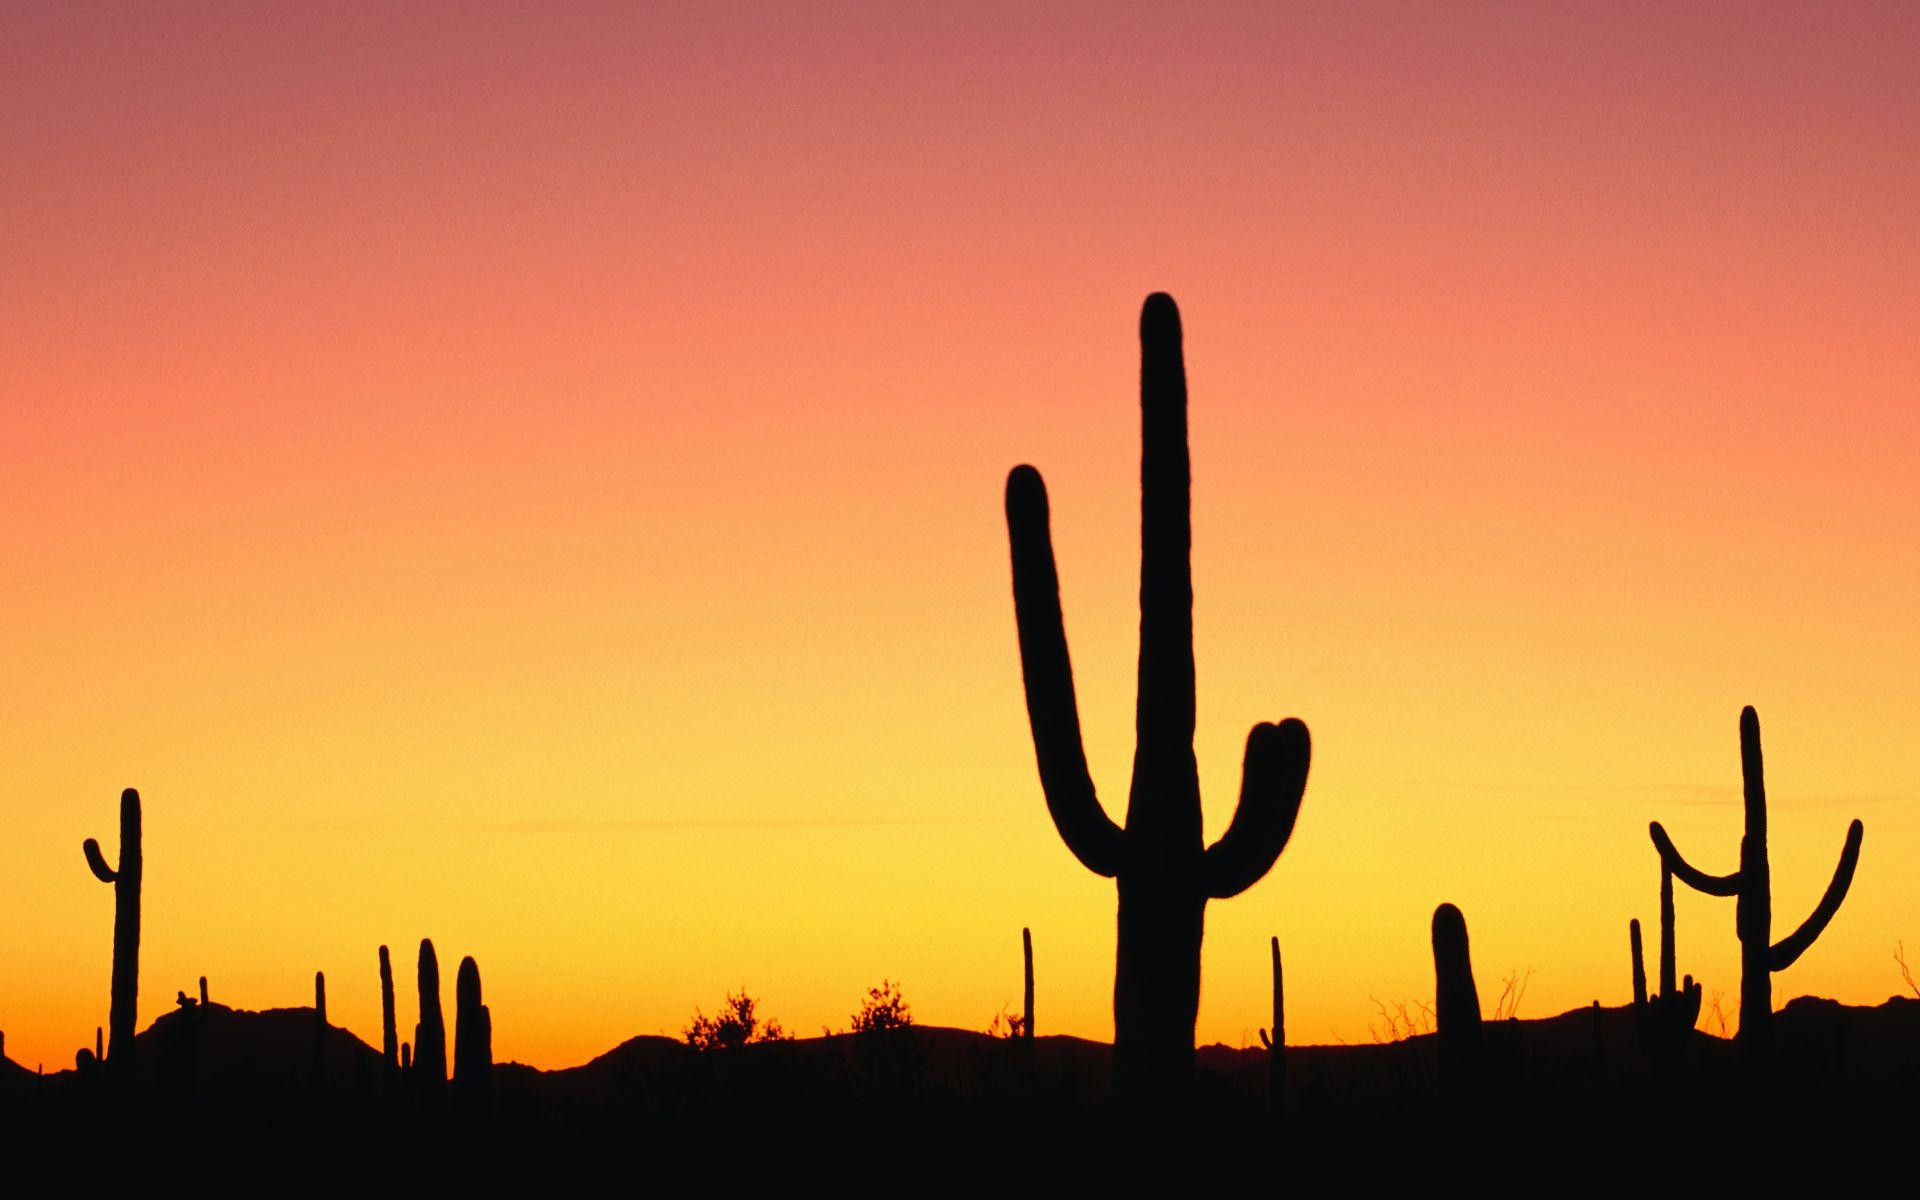 wallpaper cactus sunset winter background images sunsetcactus